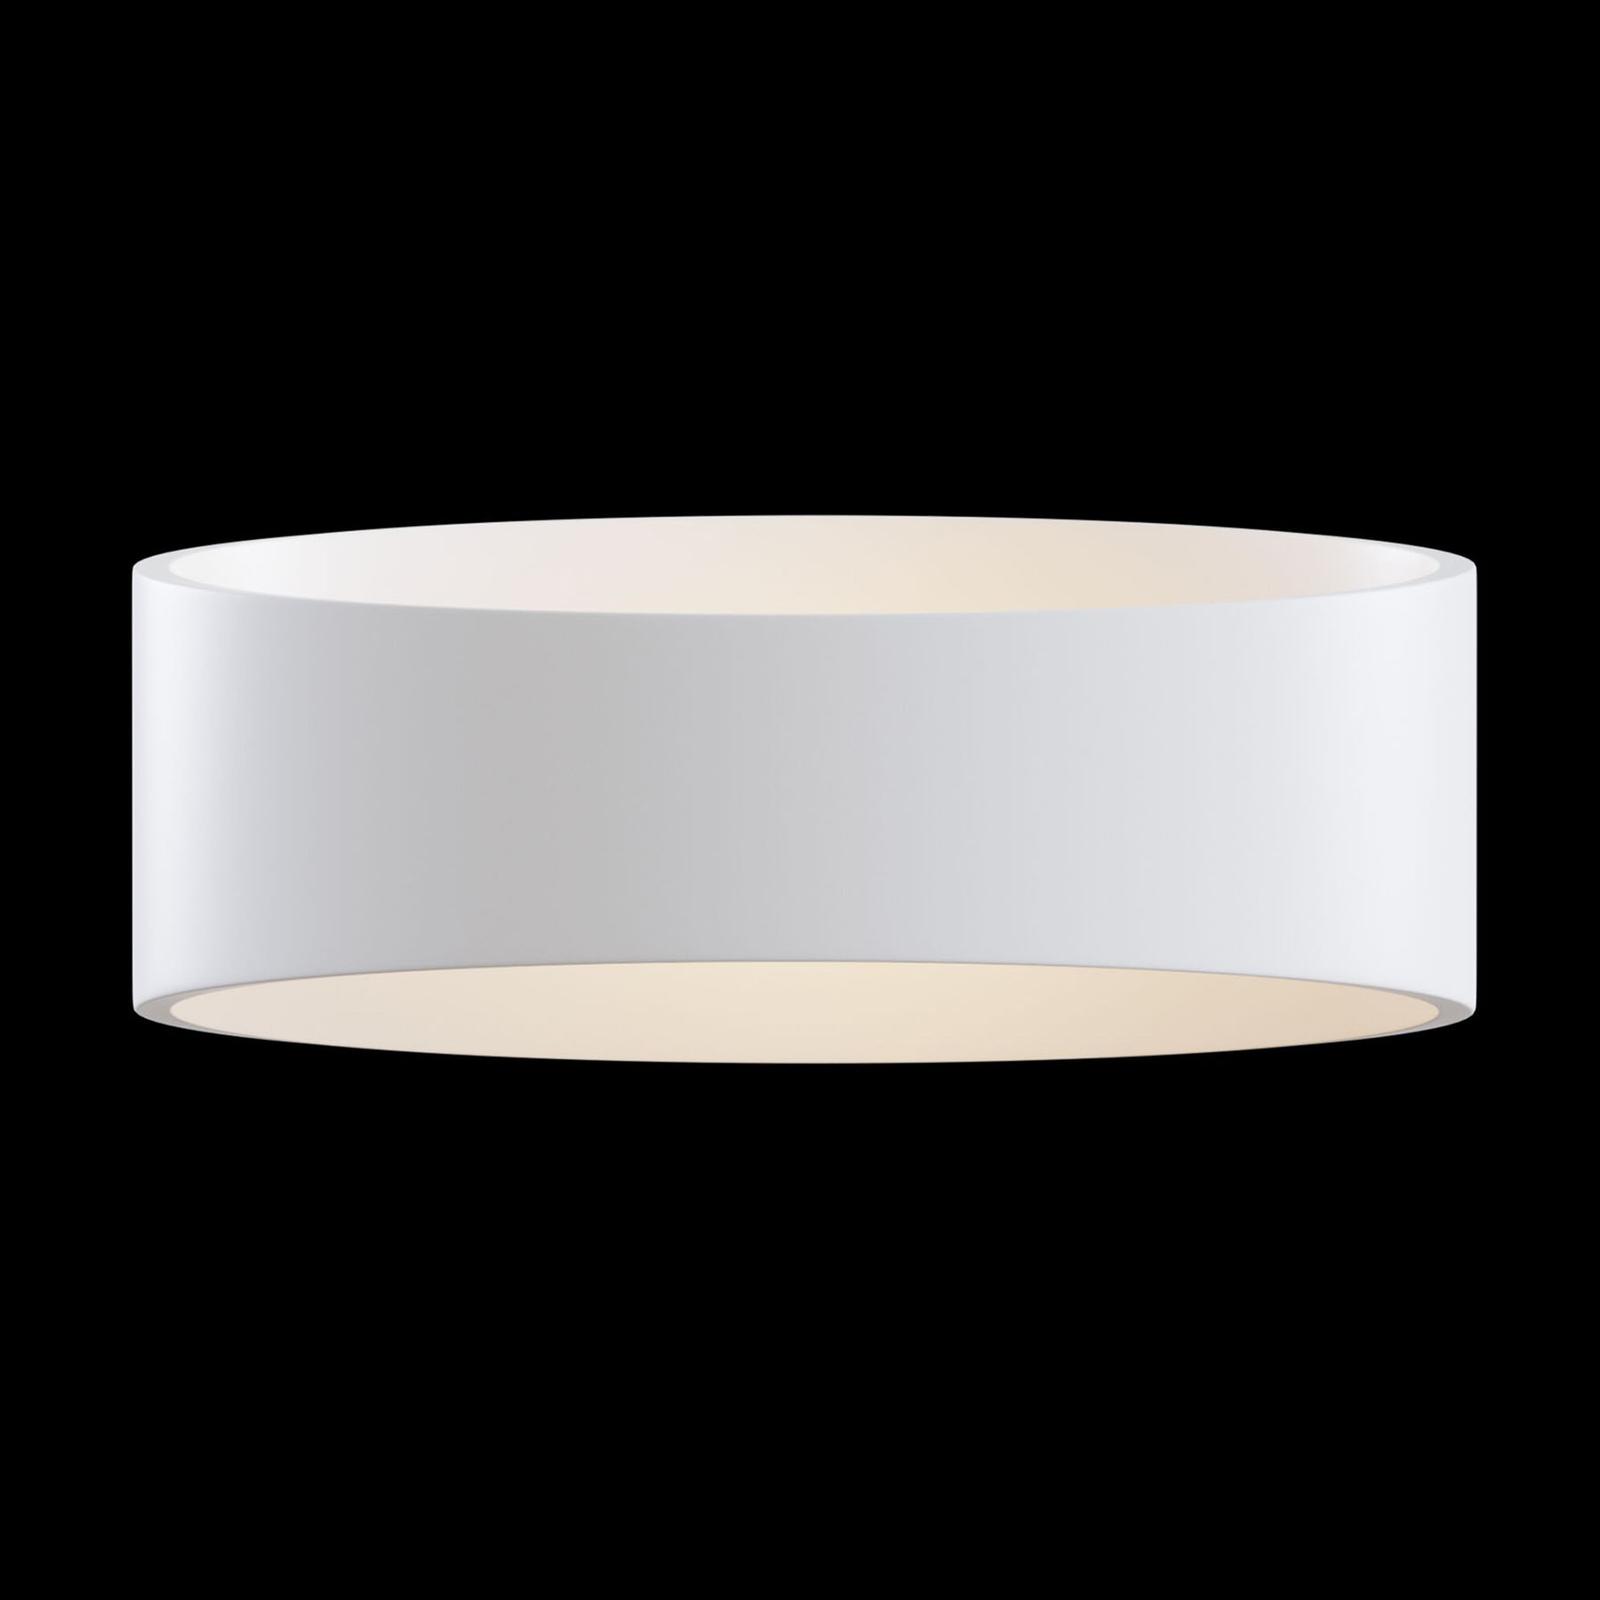 LED wandlamp Trame, ovale vorm in wit